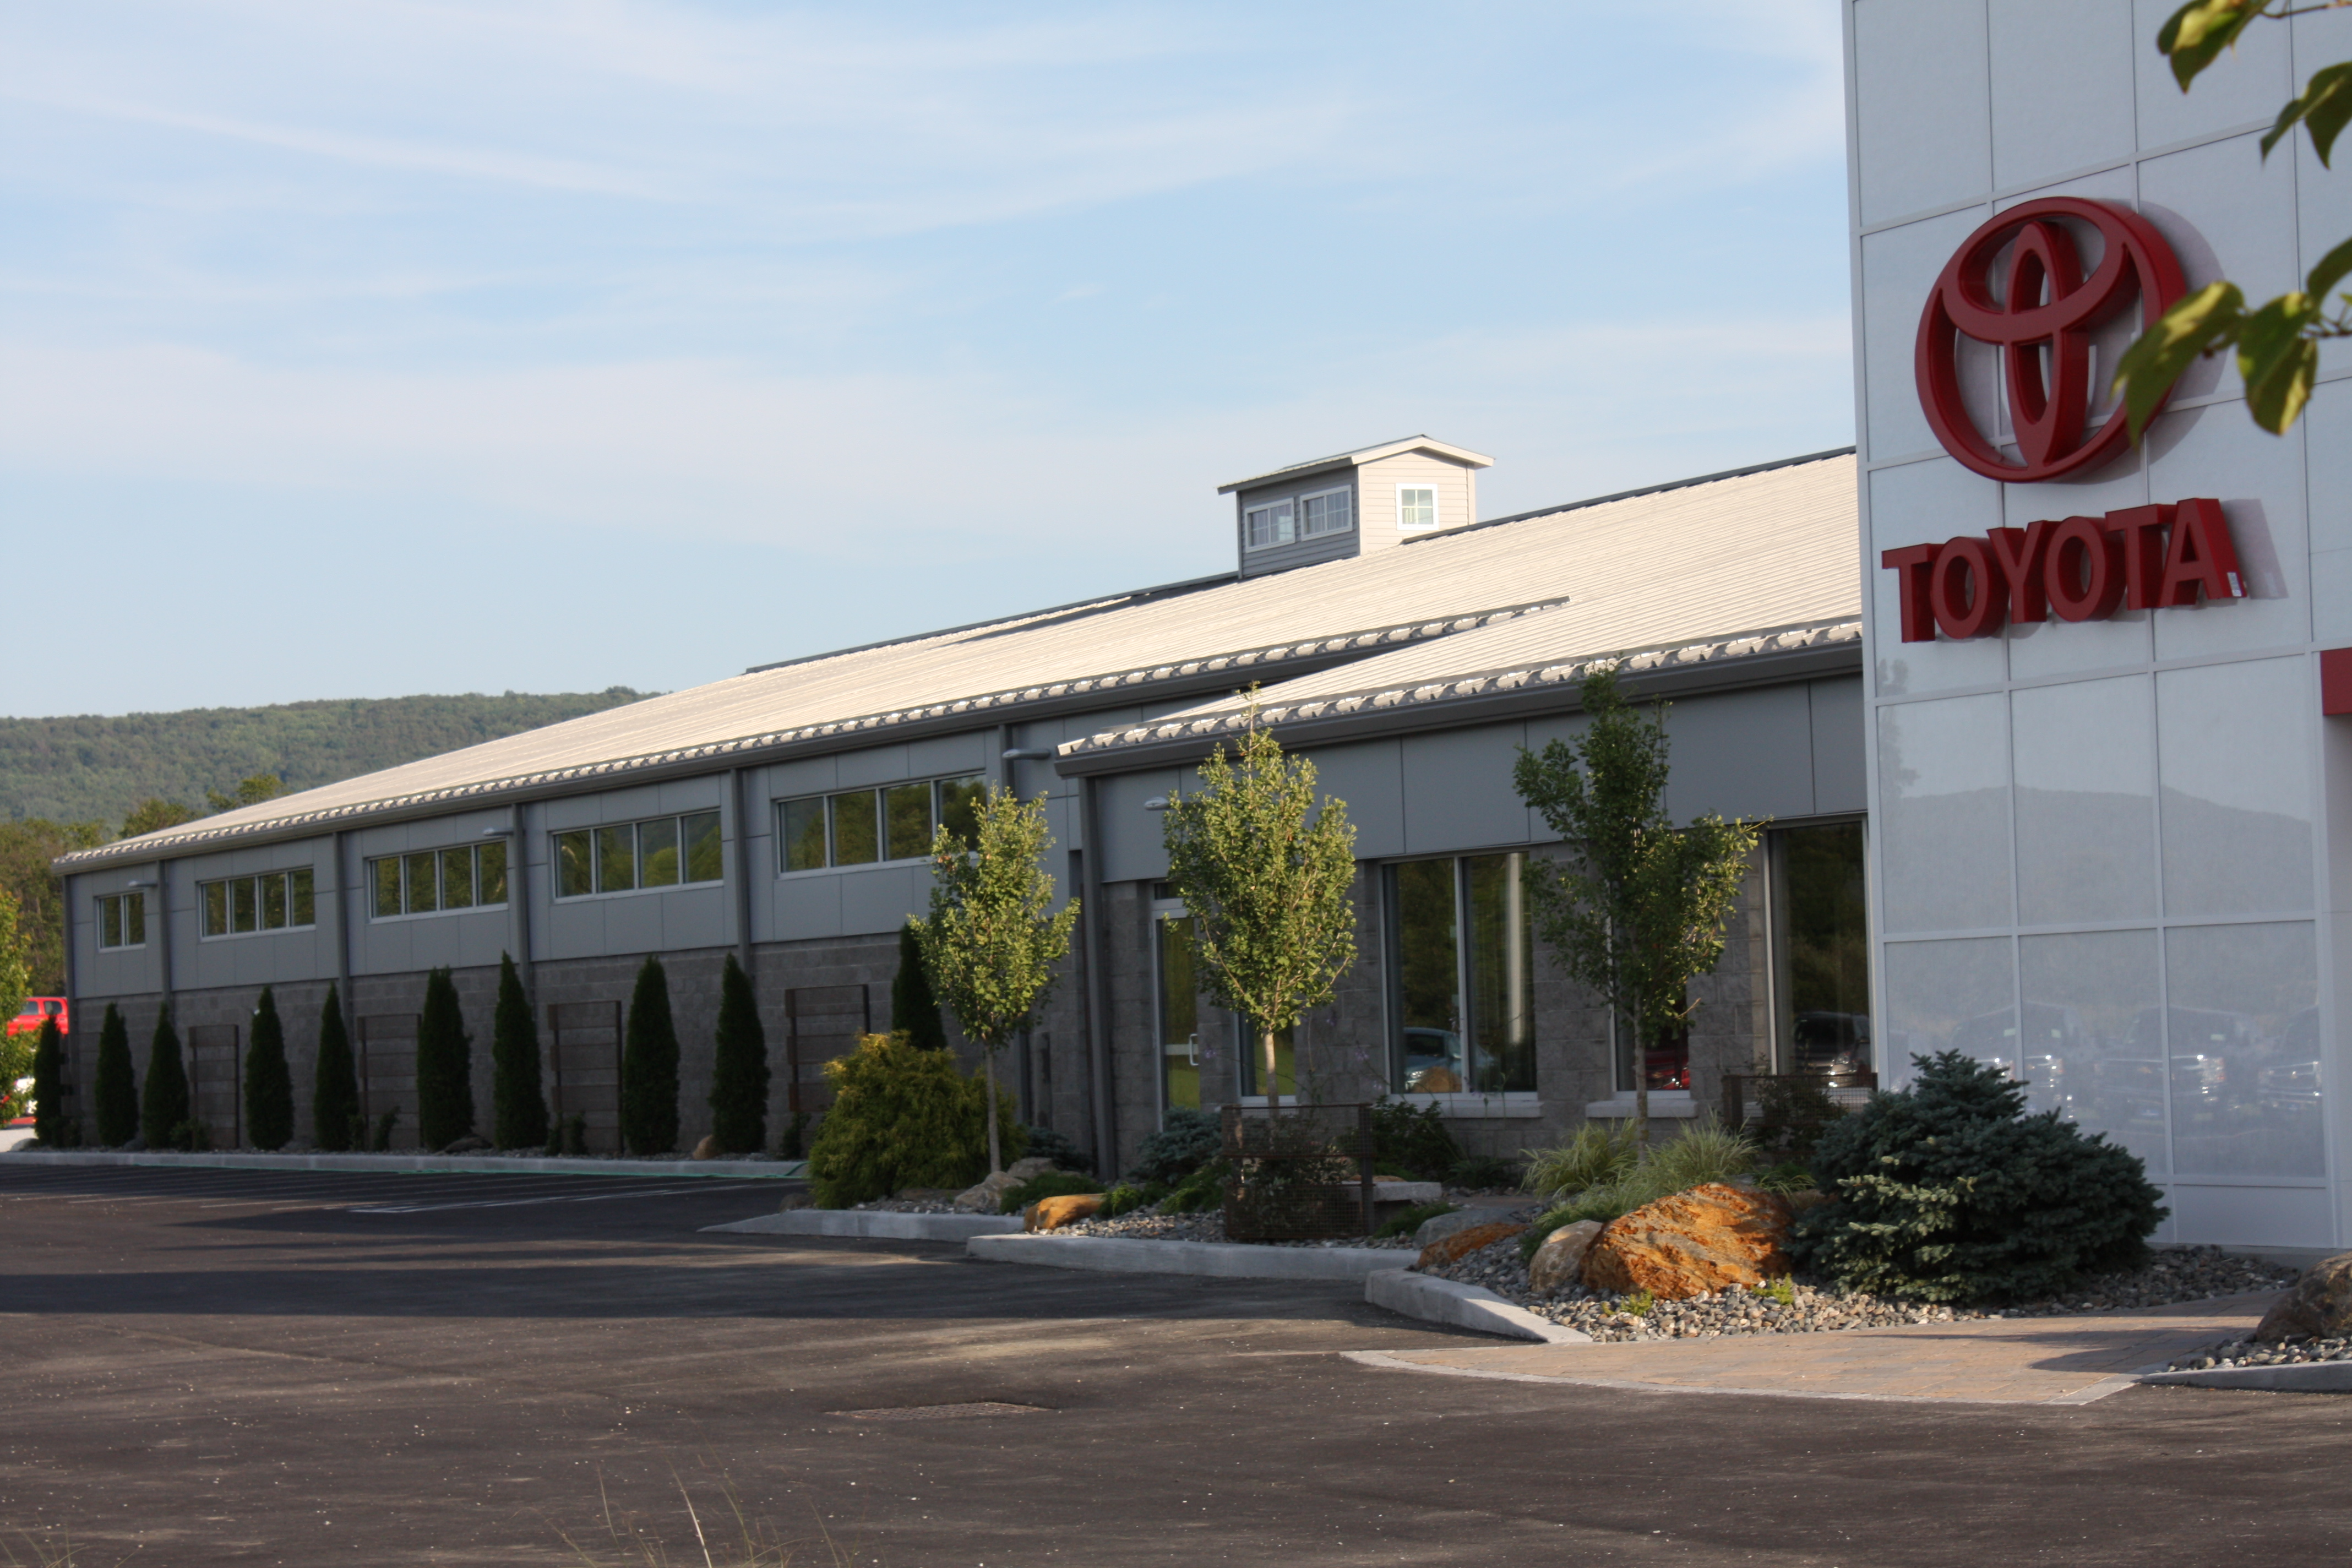 Handy Toyota New Toyota Dealership In St Albans Vt 05478